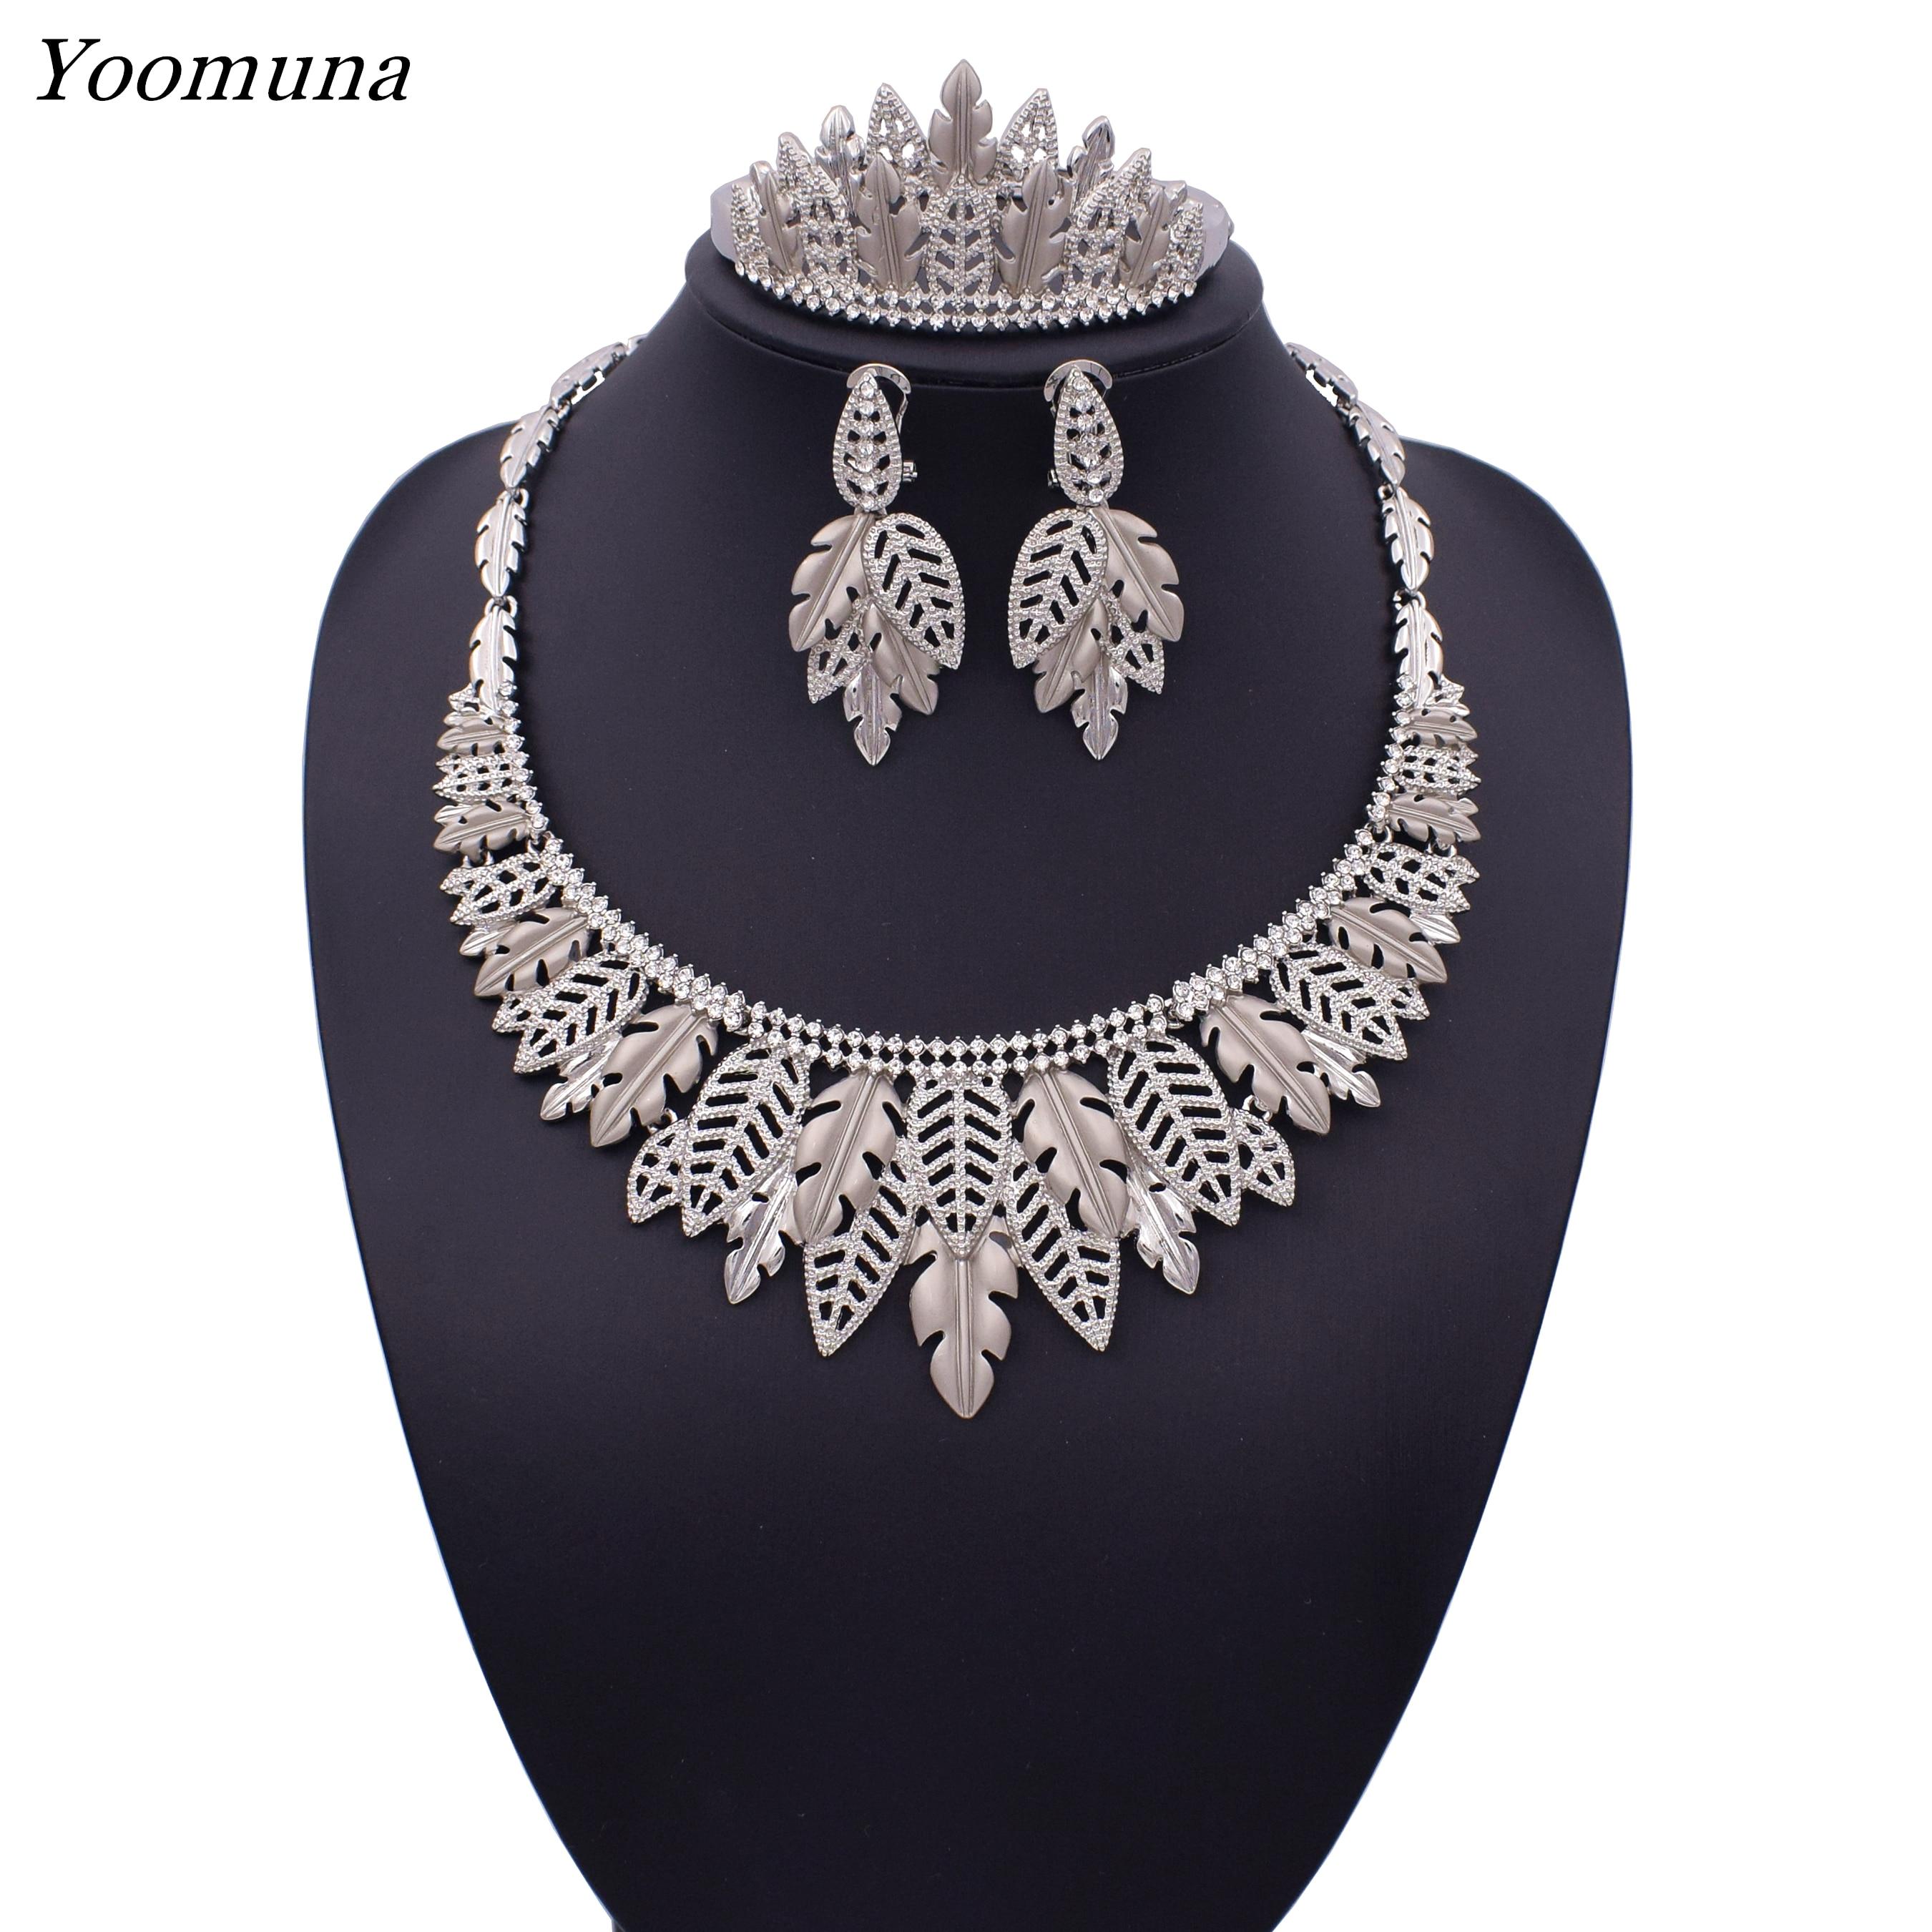 2019 Luxury dubai Wedding Bridal Jewelry Sets for Women african elegant classics leaf Crystal jewelry women party gifts